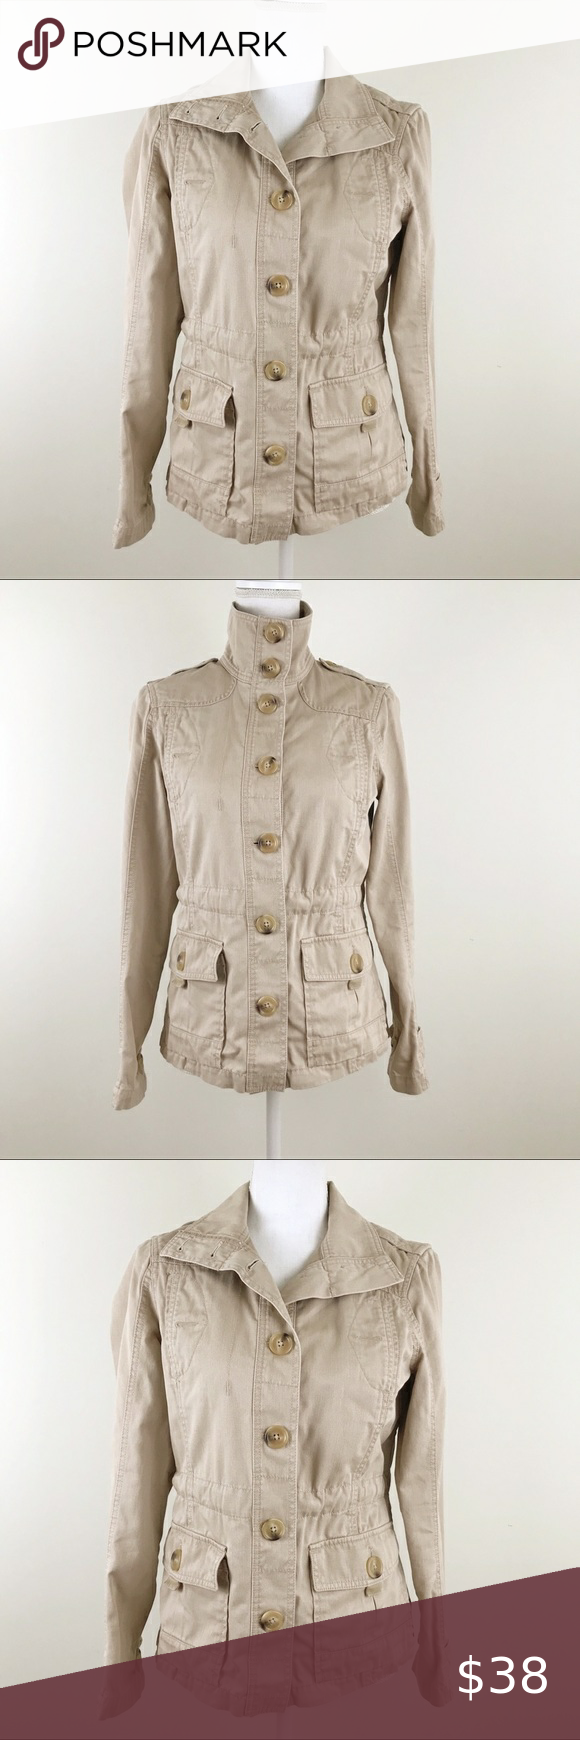 Eddie Bauer Utility Jacket Coat Khaki Light Tan S